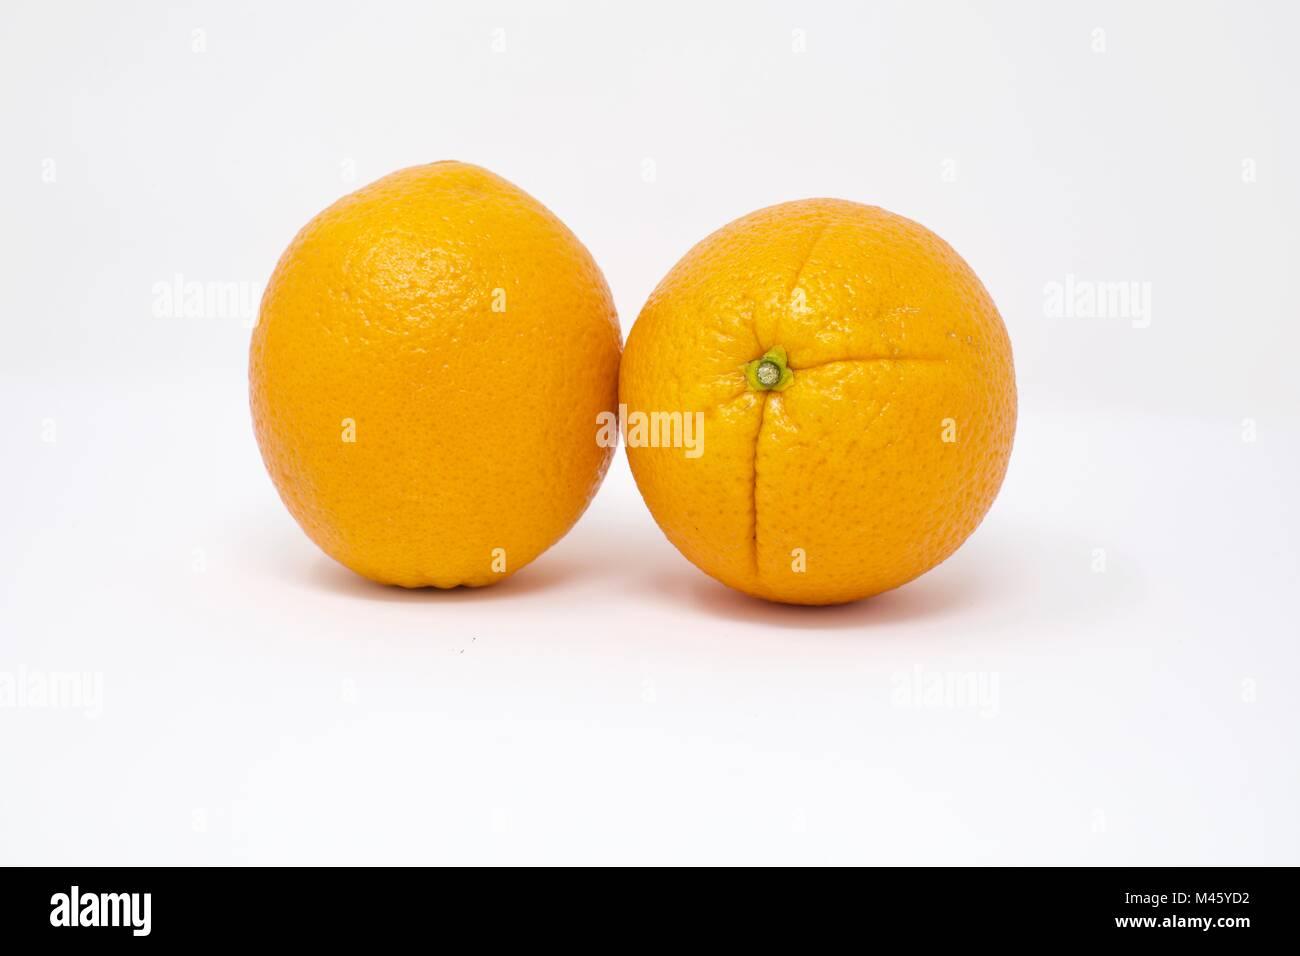 Two fresh whole Oranges (Citrus sinensis) on a white background - Stock Image